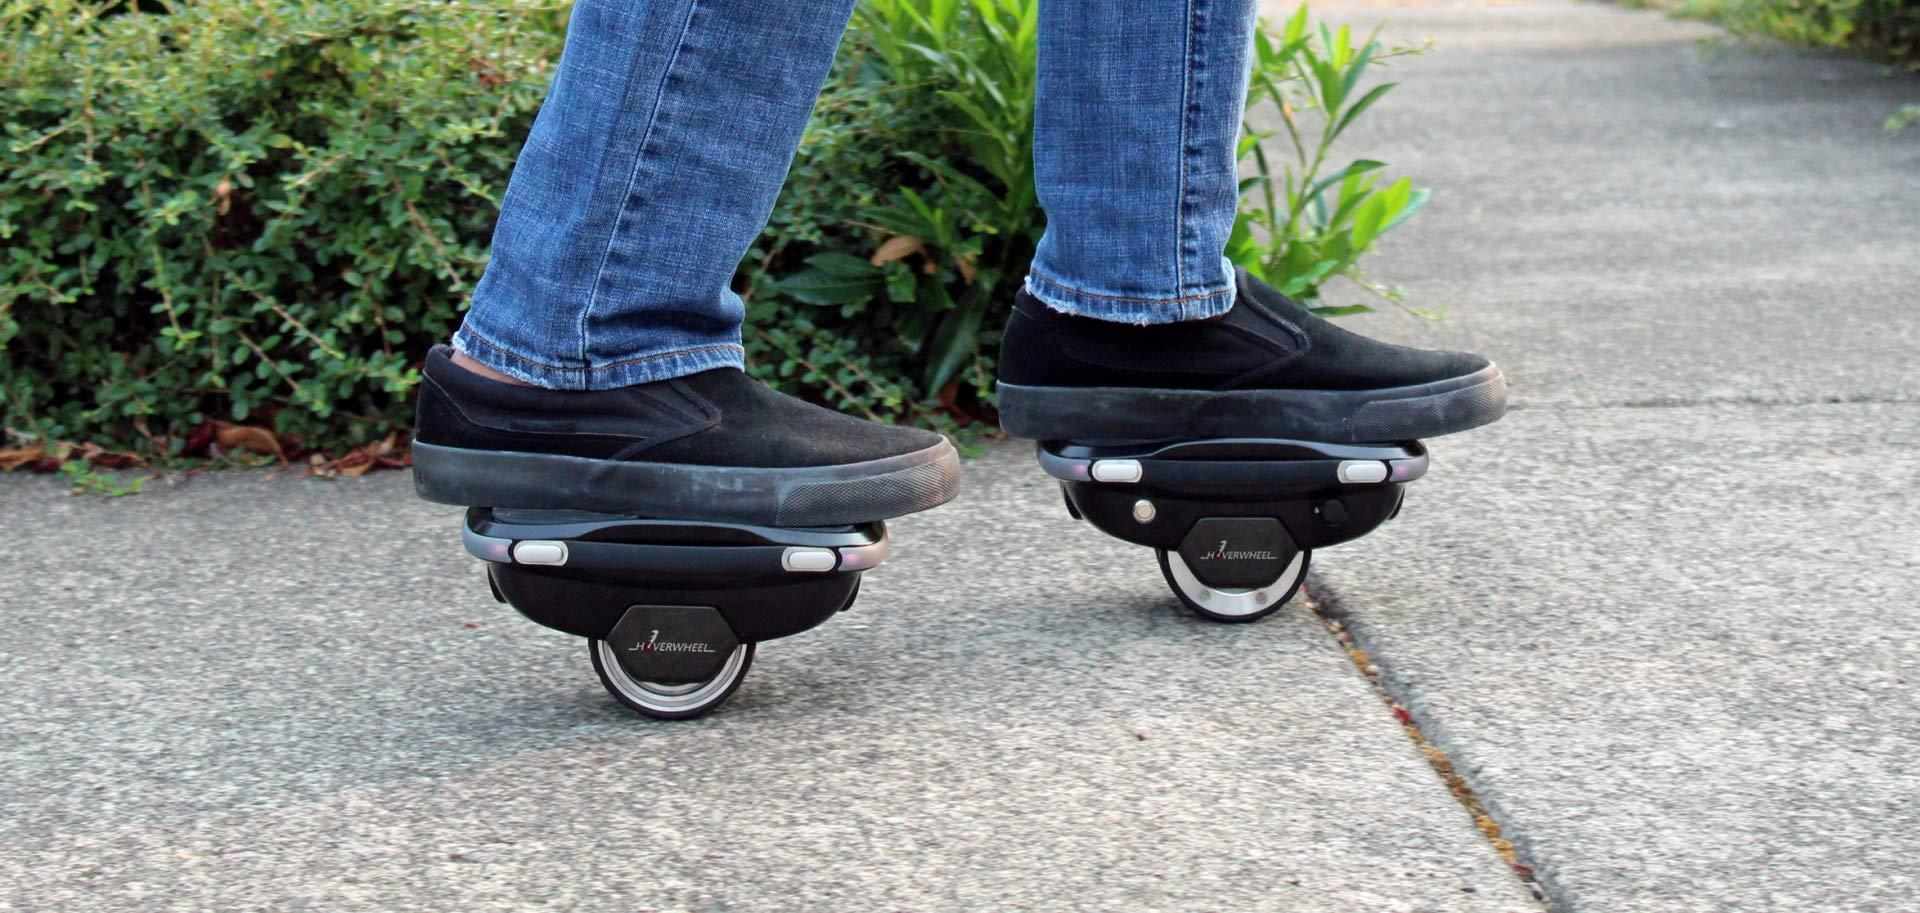 Hoverwheel - Hoverskates - Self-Balancing Hoverboard-Style Hovershoe Skates